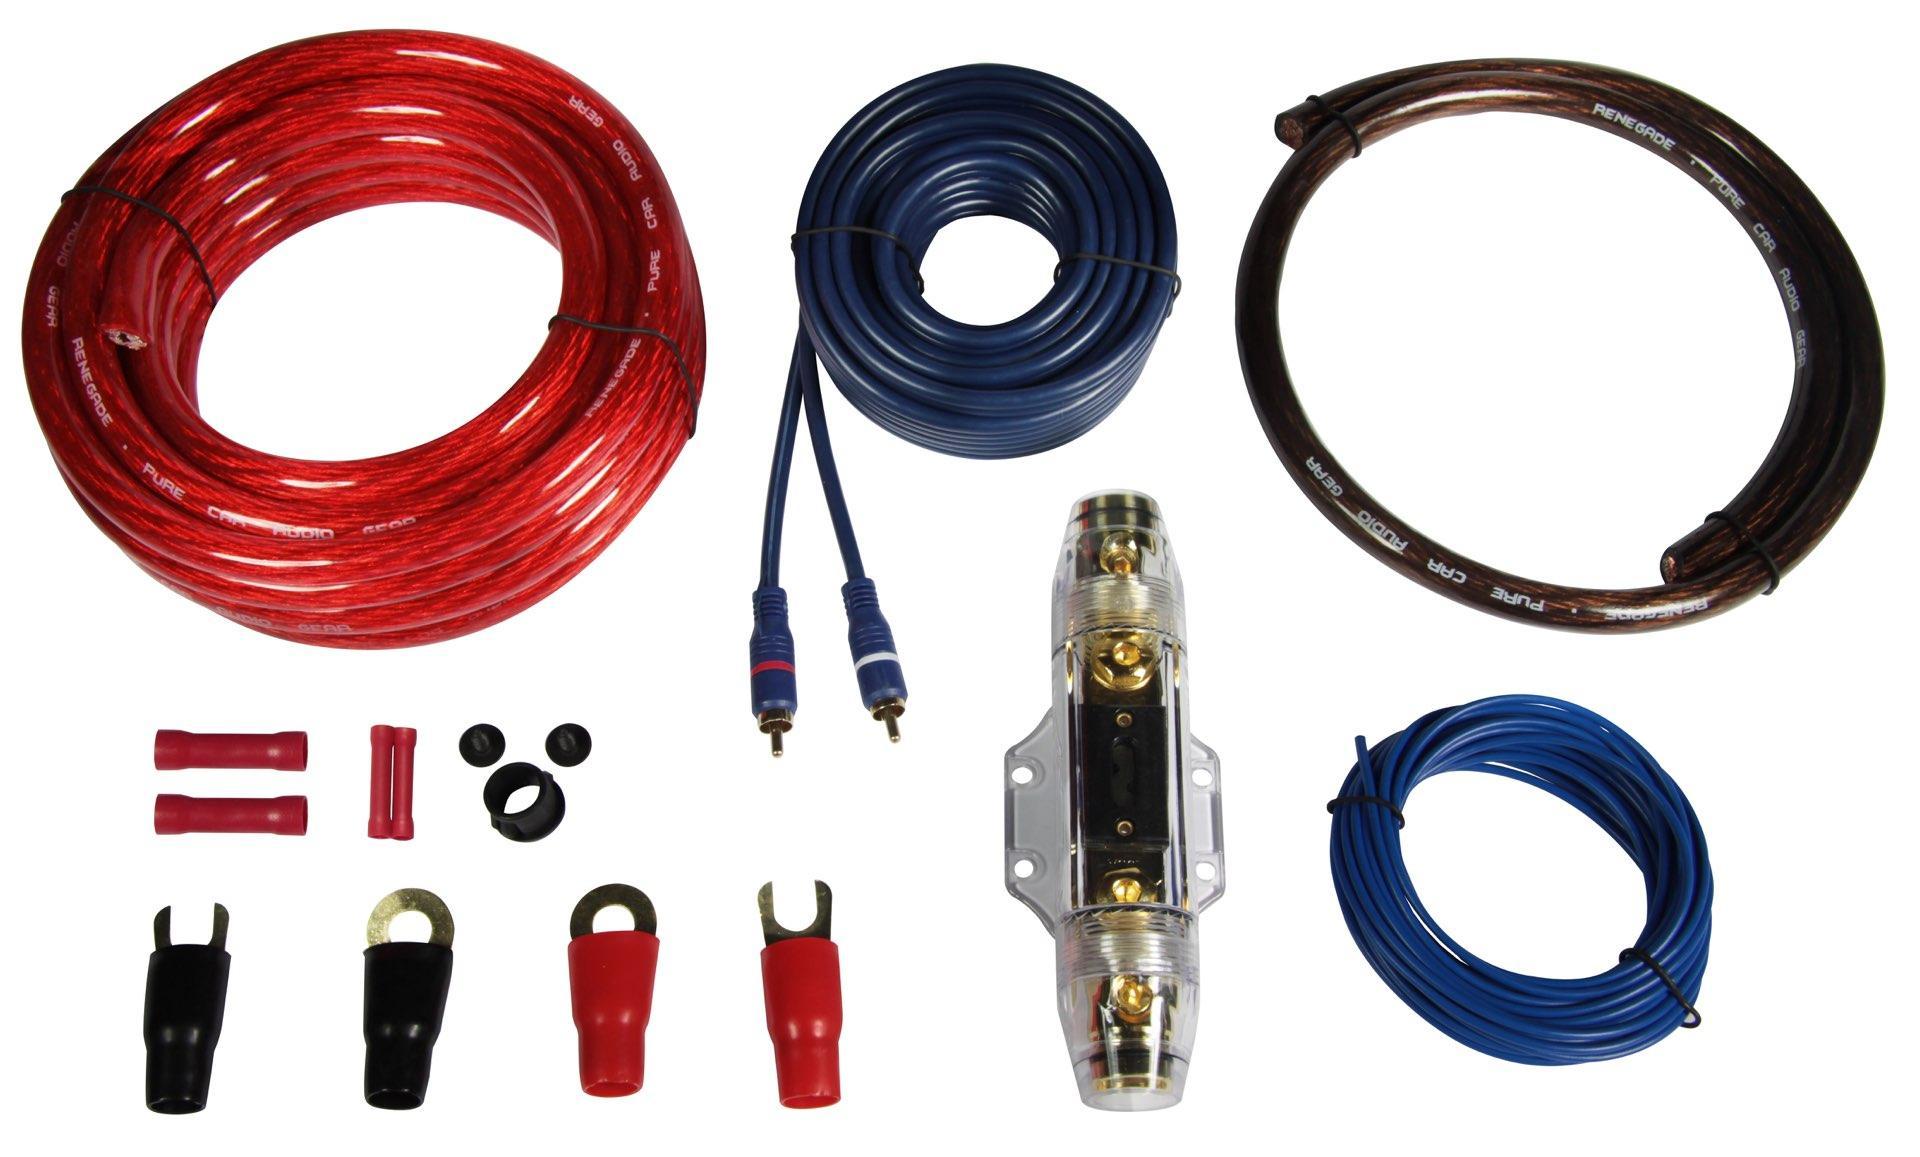 Endstufen-Kabelset REN35KIT RENEGADE REN35KIT in Original Qualität